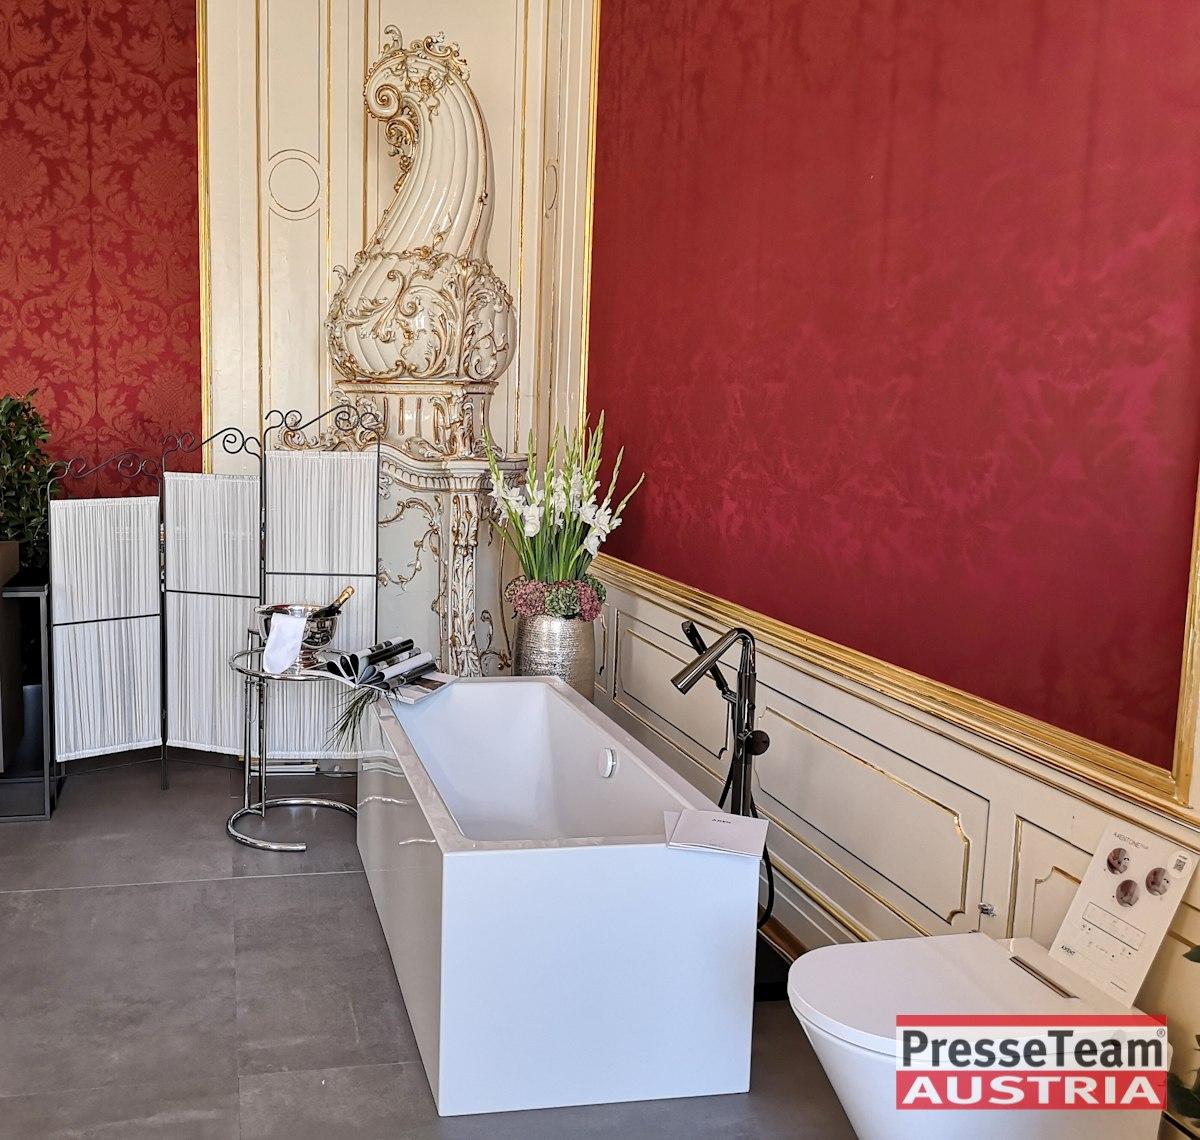 Messe Hofburg Wien 32 - Luxus Möbelmesse & Lifestyle in der Hofburg Wien